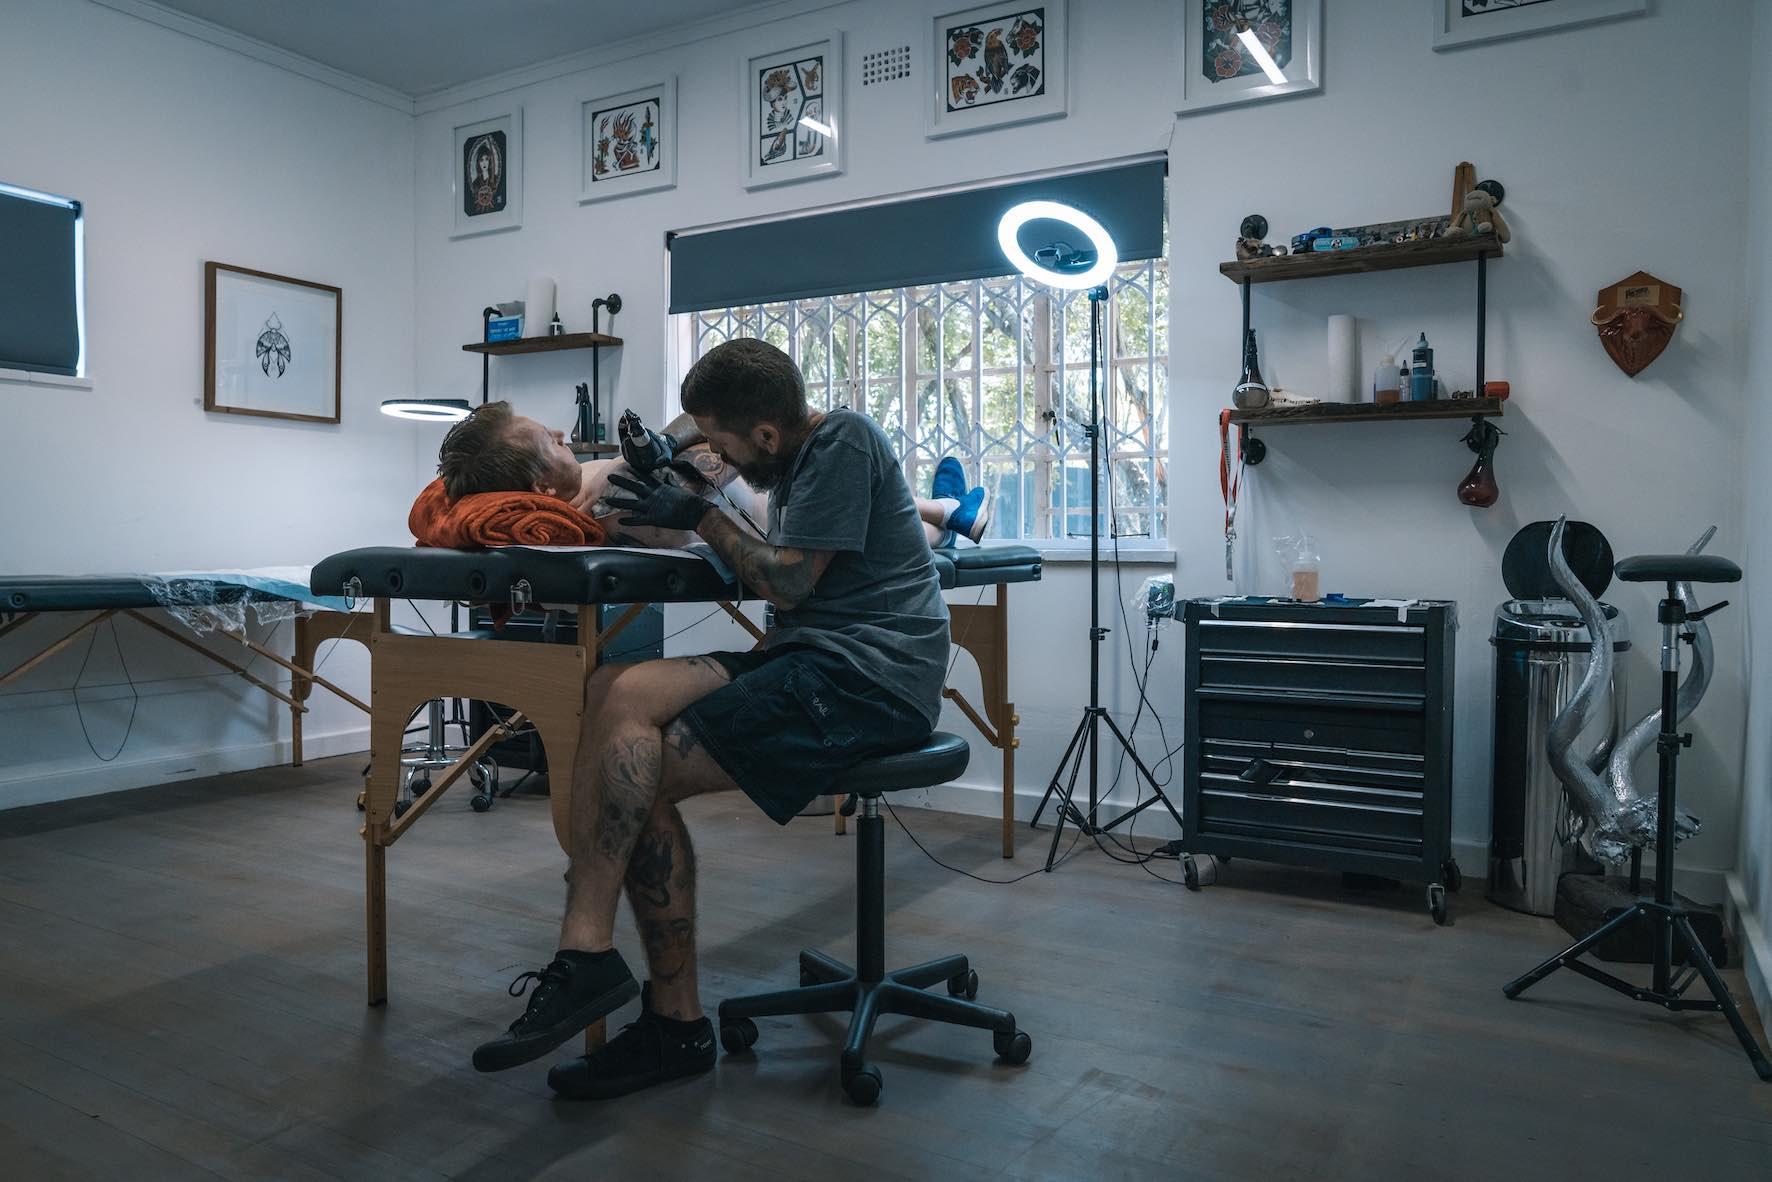 Jan 'Munky' Giebelmann of Fallen Heroes Tattoos